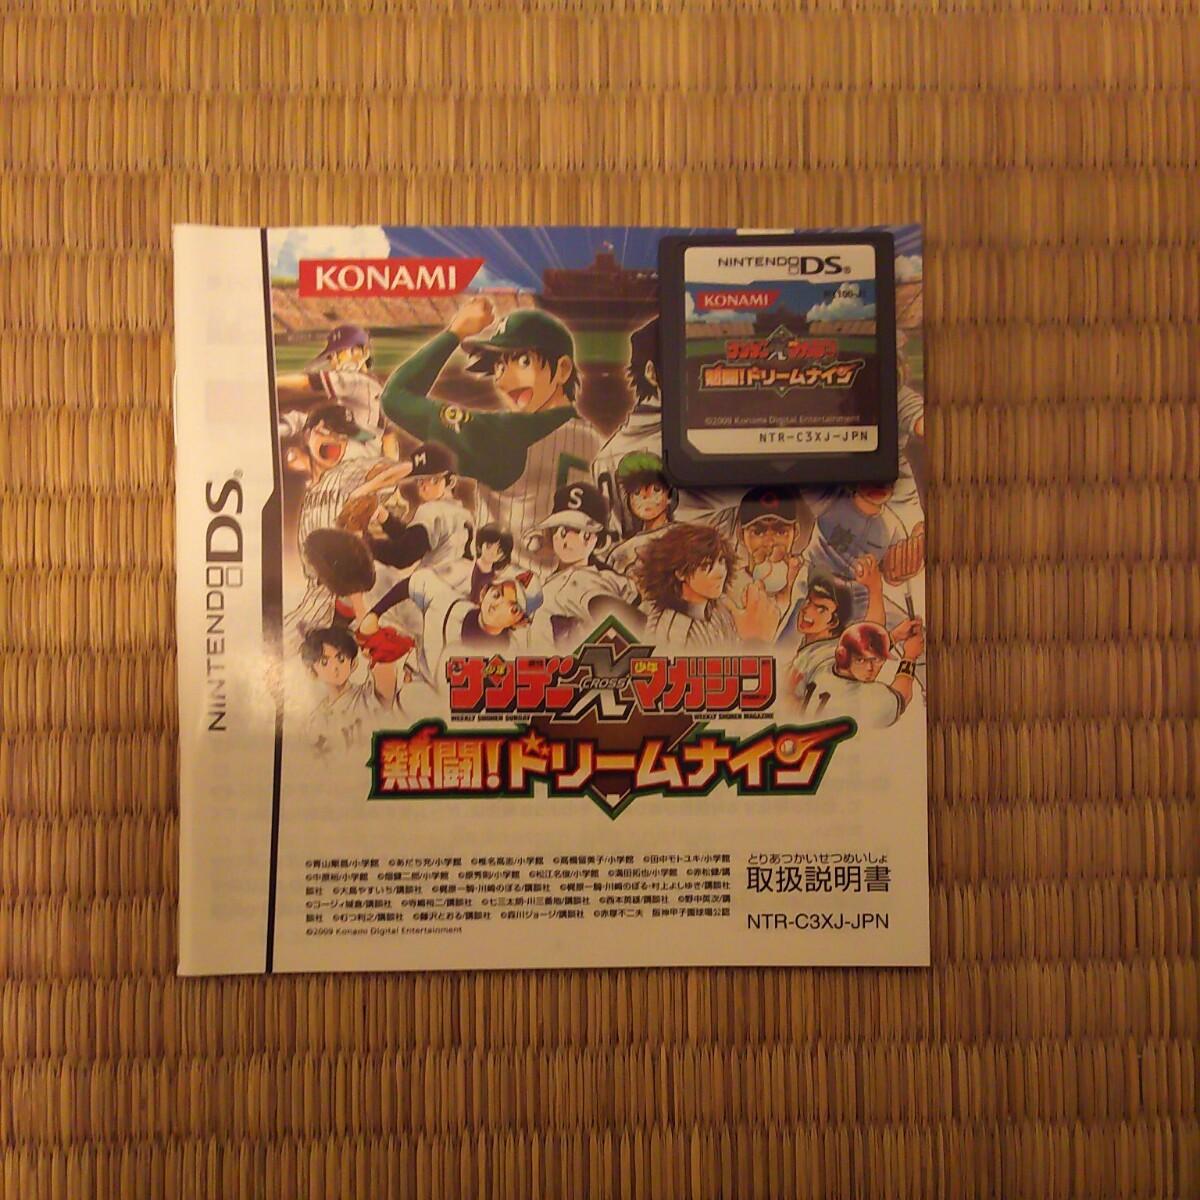 NintendoDSソフト  サンデー×マガジン 熱闘! ドリームナイン